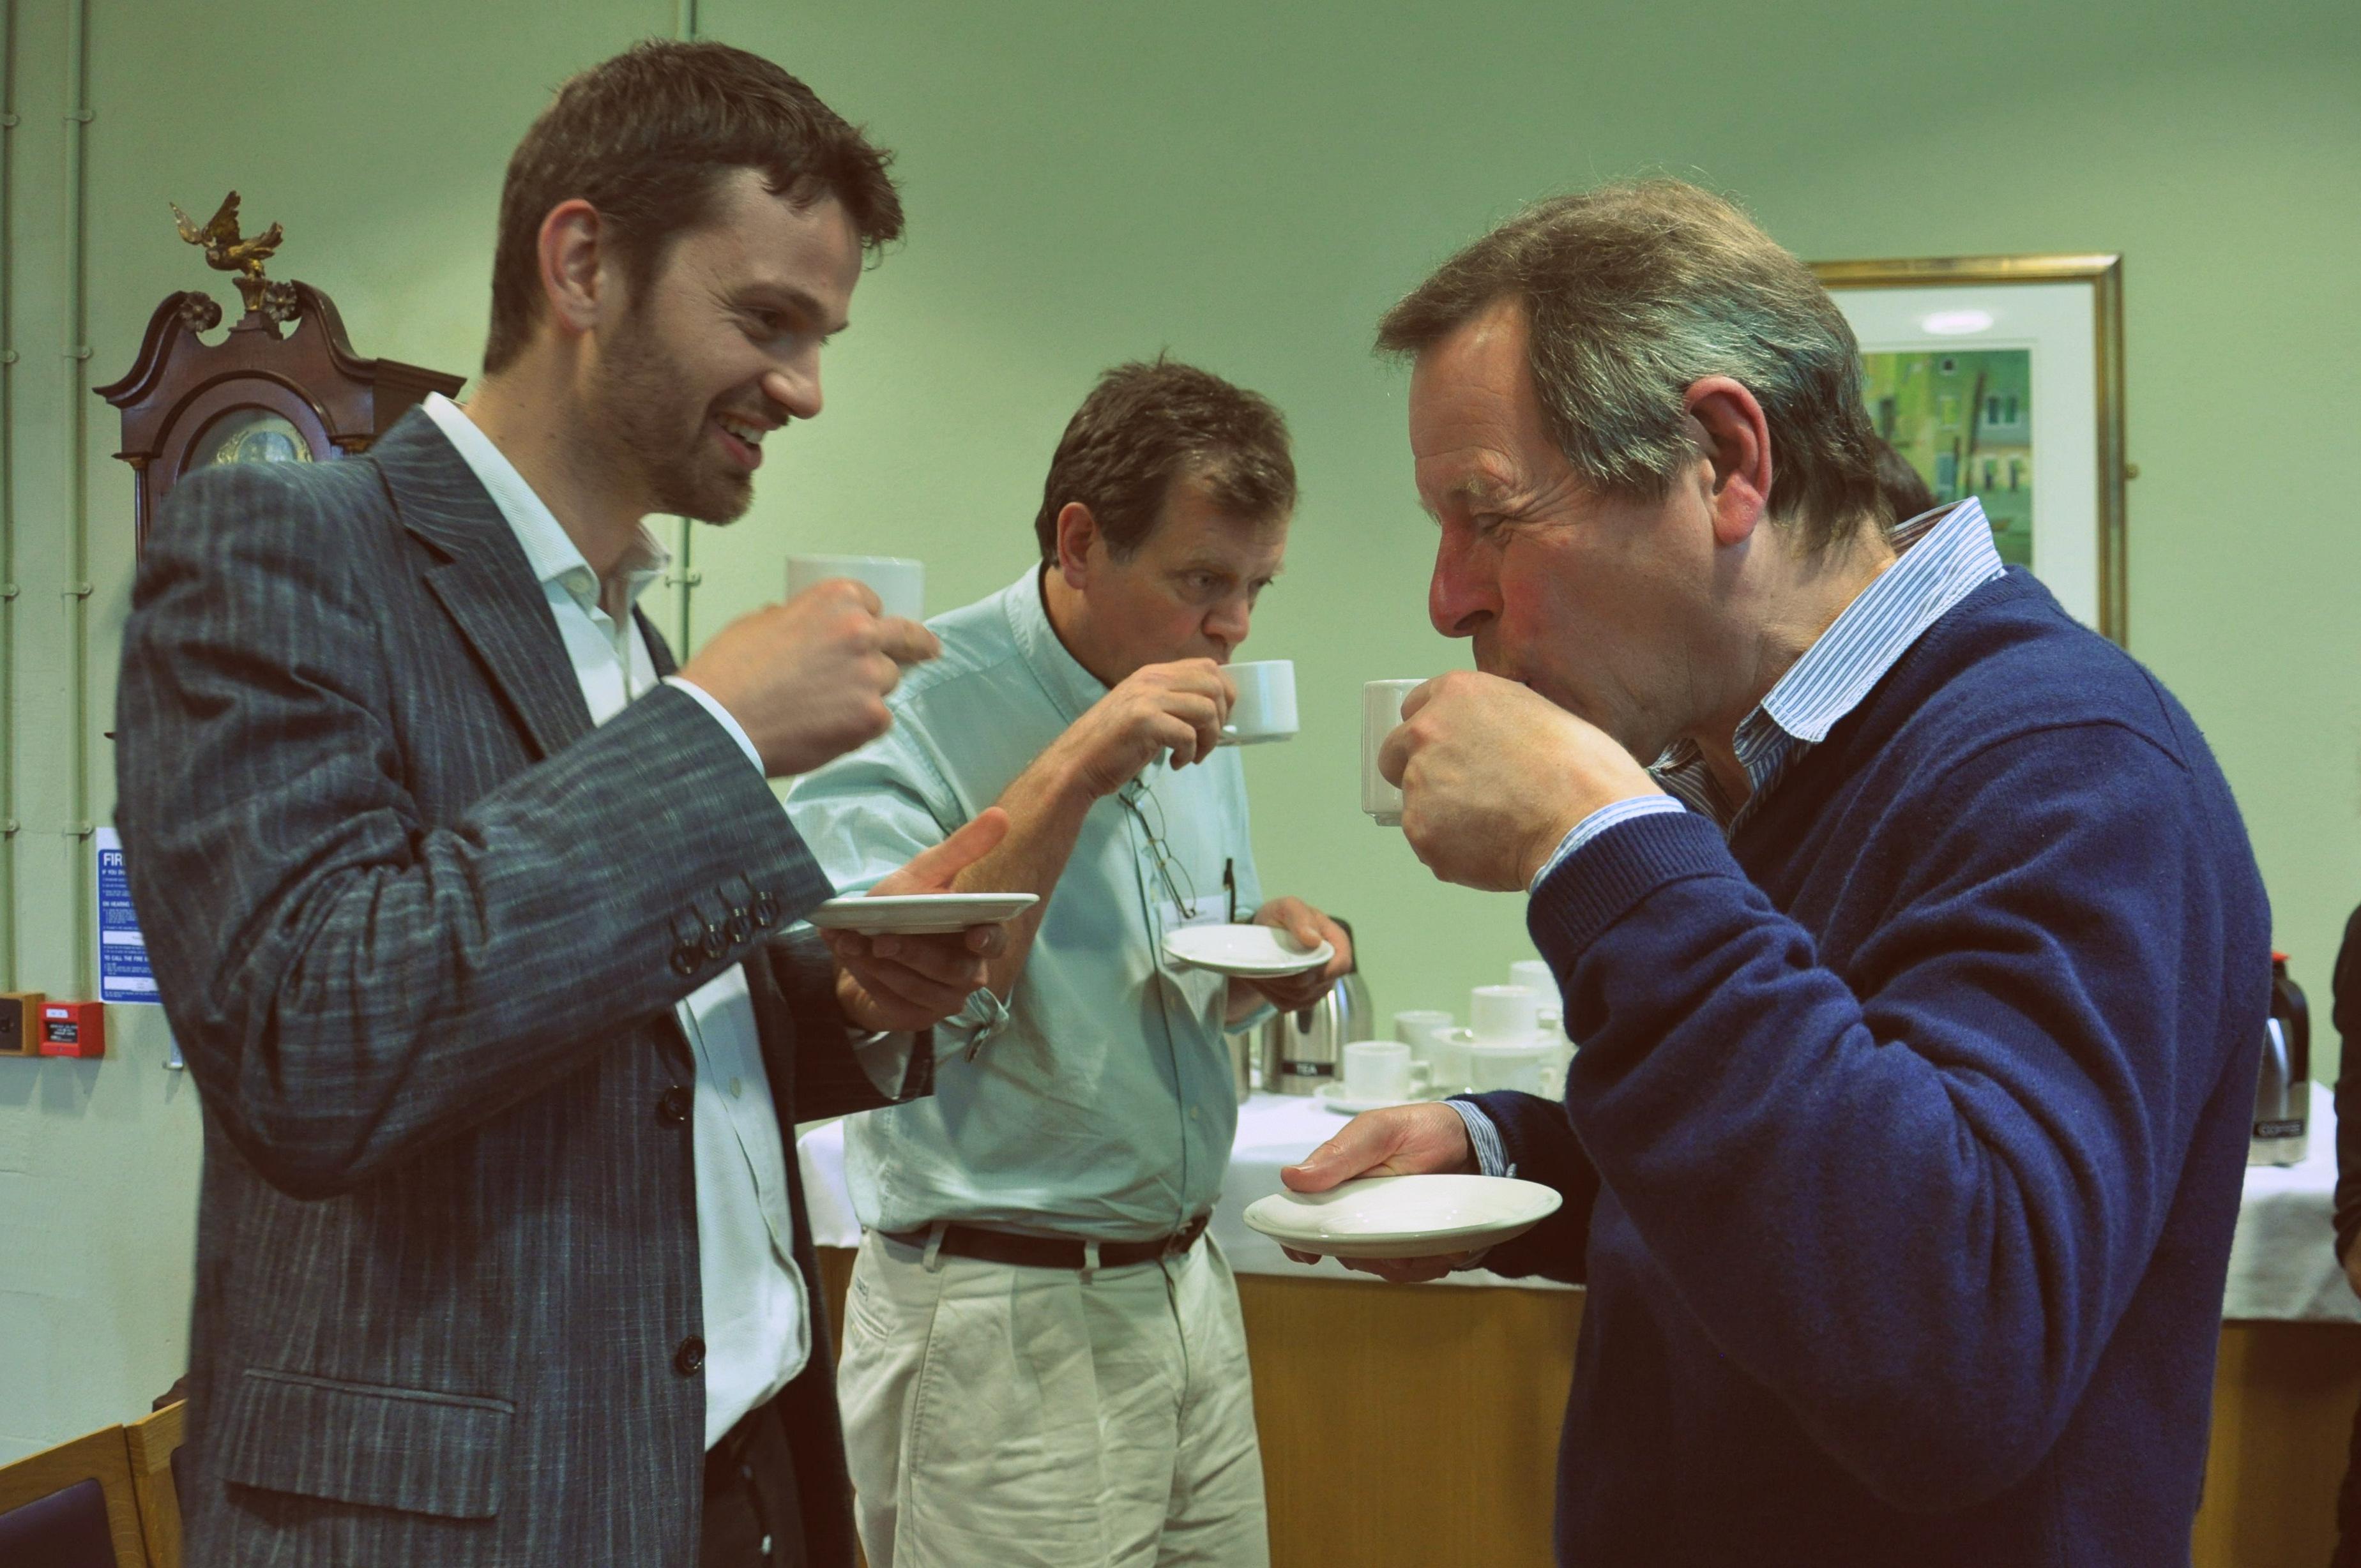 food-system-transparency-david-barling-a